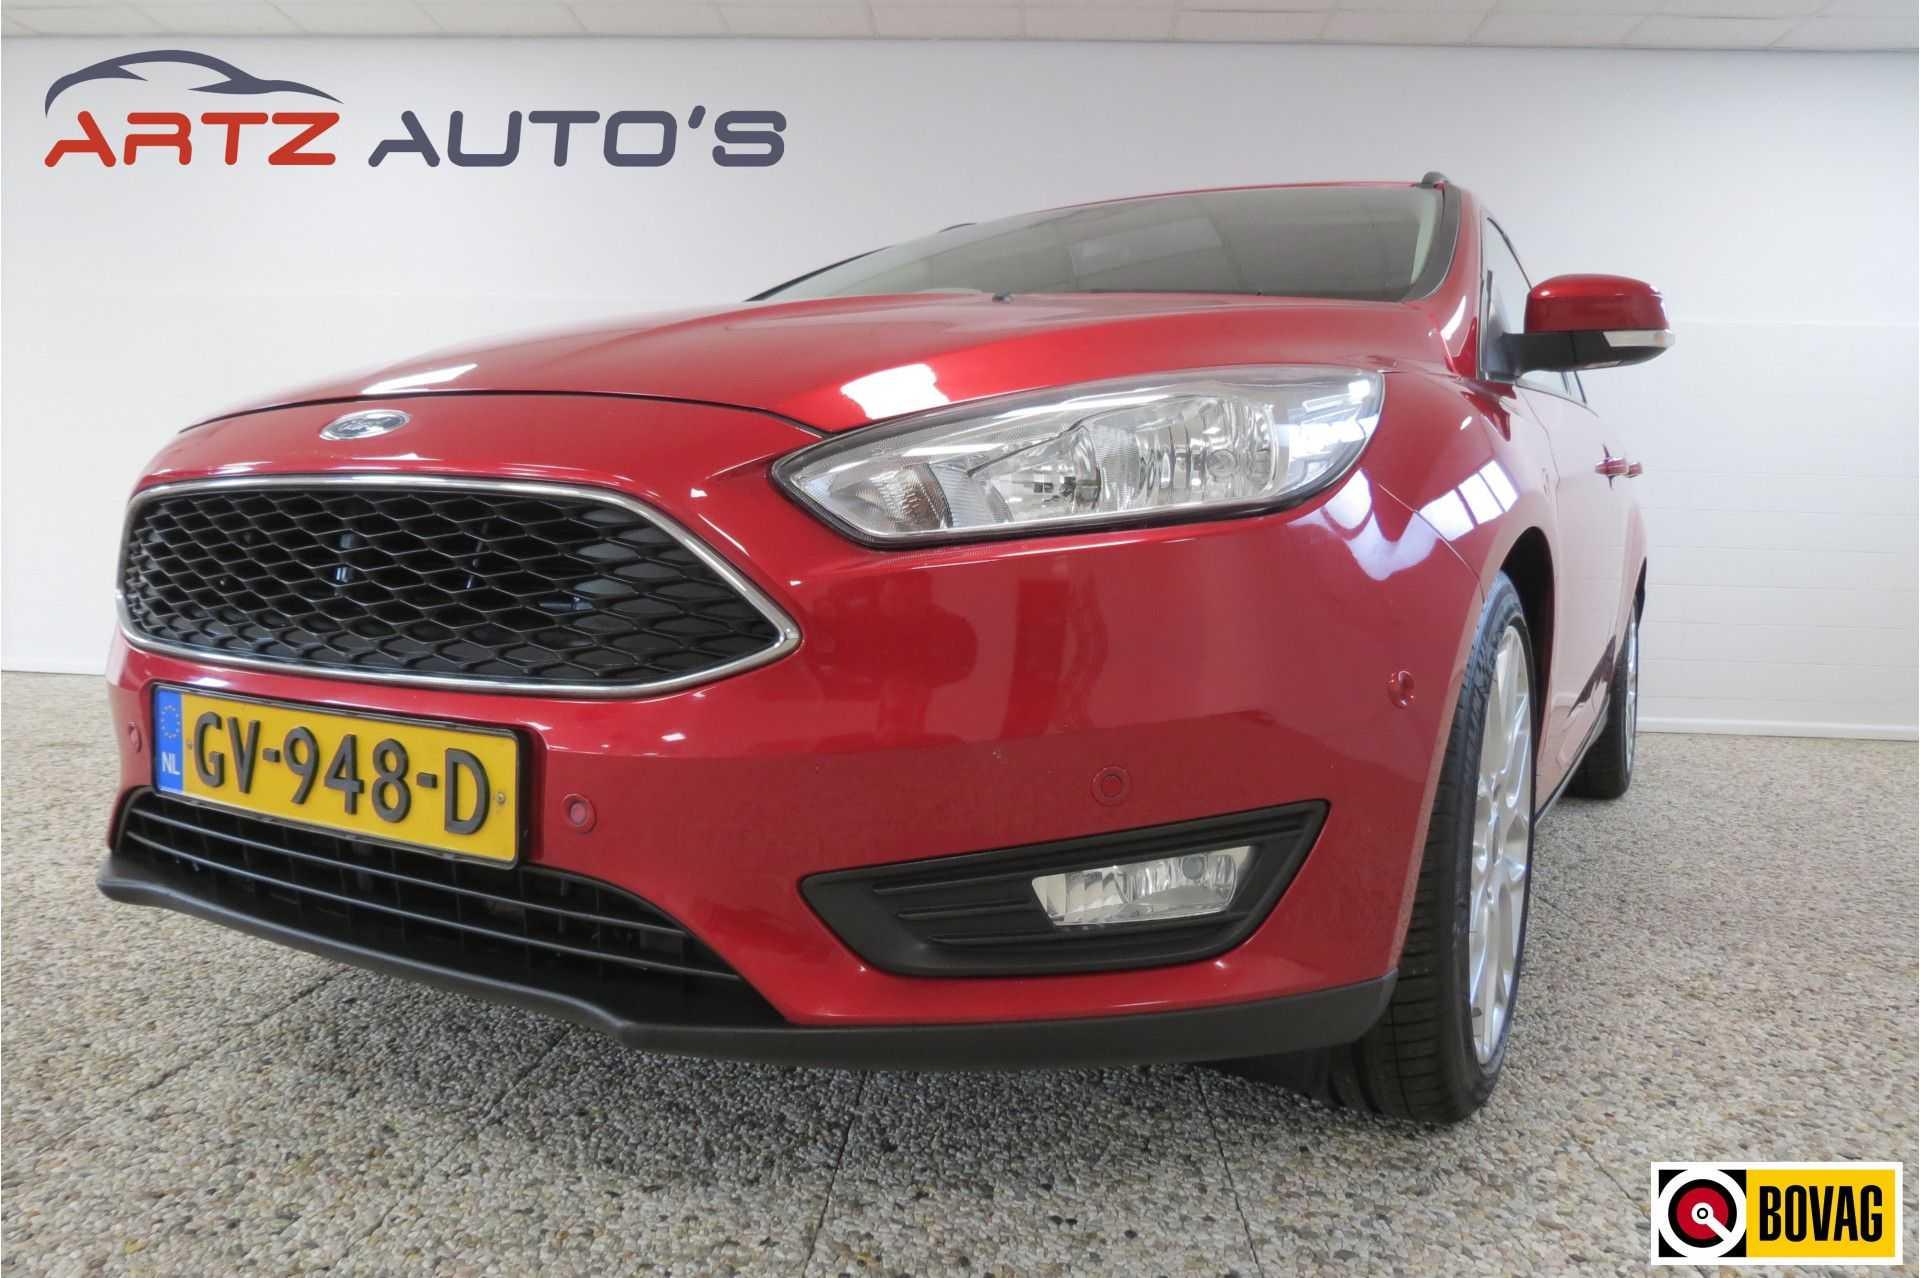 Ford Focus Wagon 1.5 Titanium | 150 PK | SYNC 2 | ADVANCED PACK | WINTER PACK | GETINT GLAS